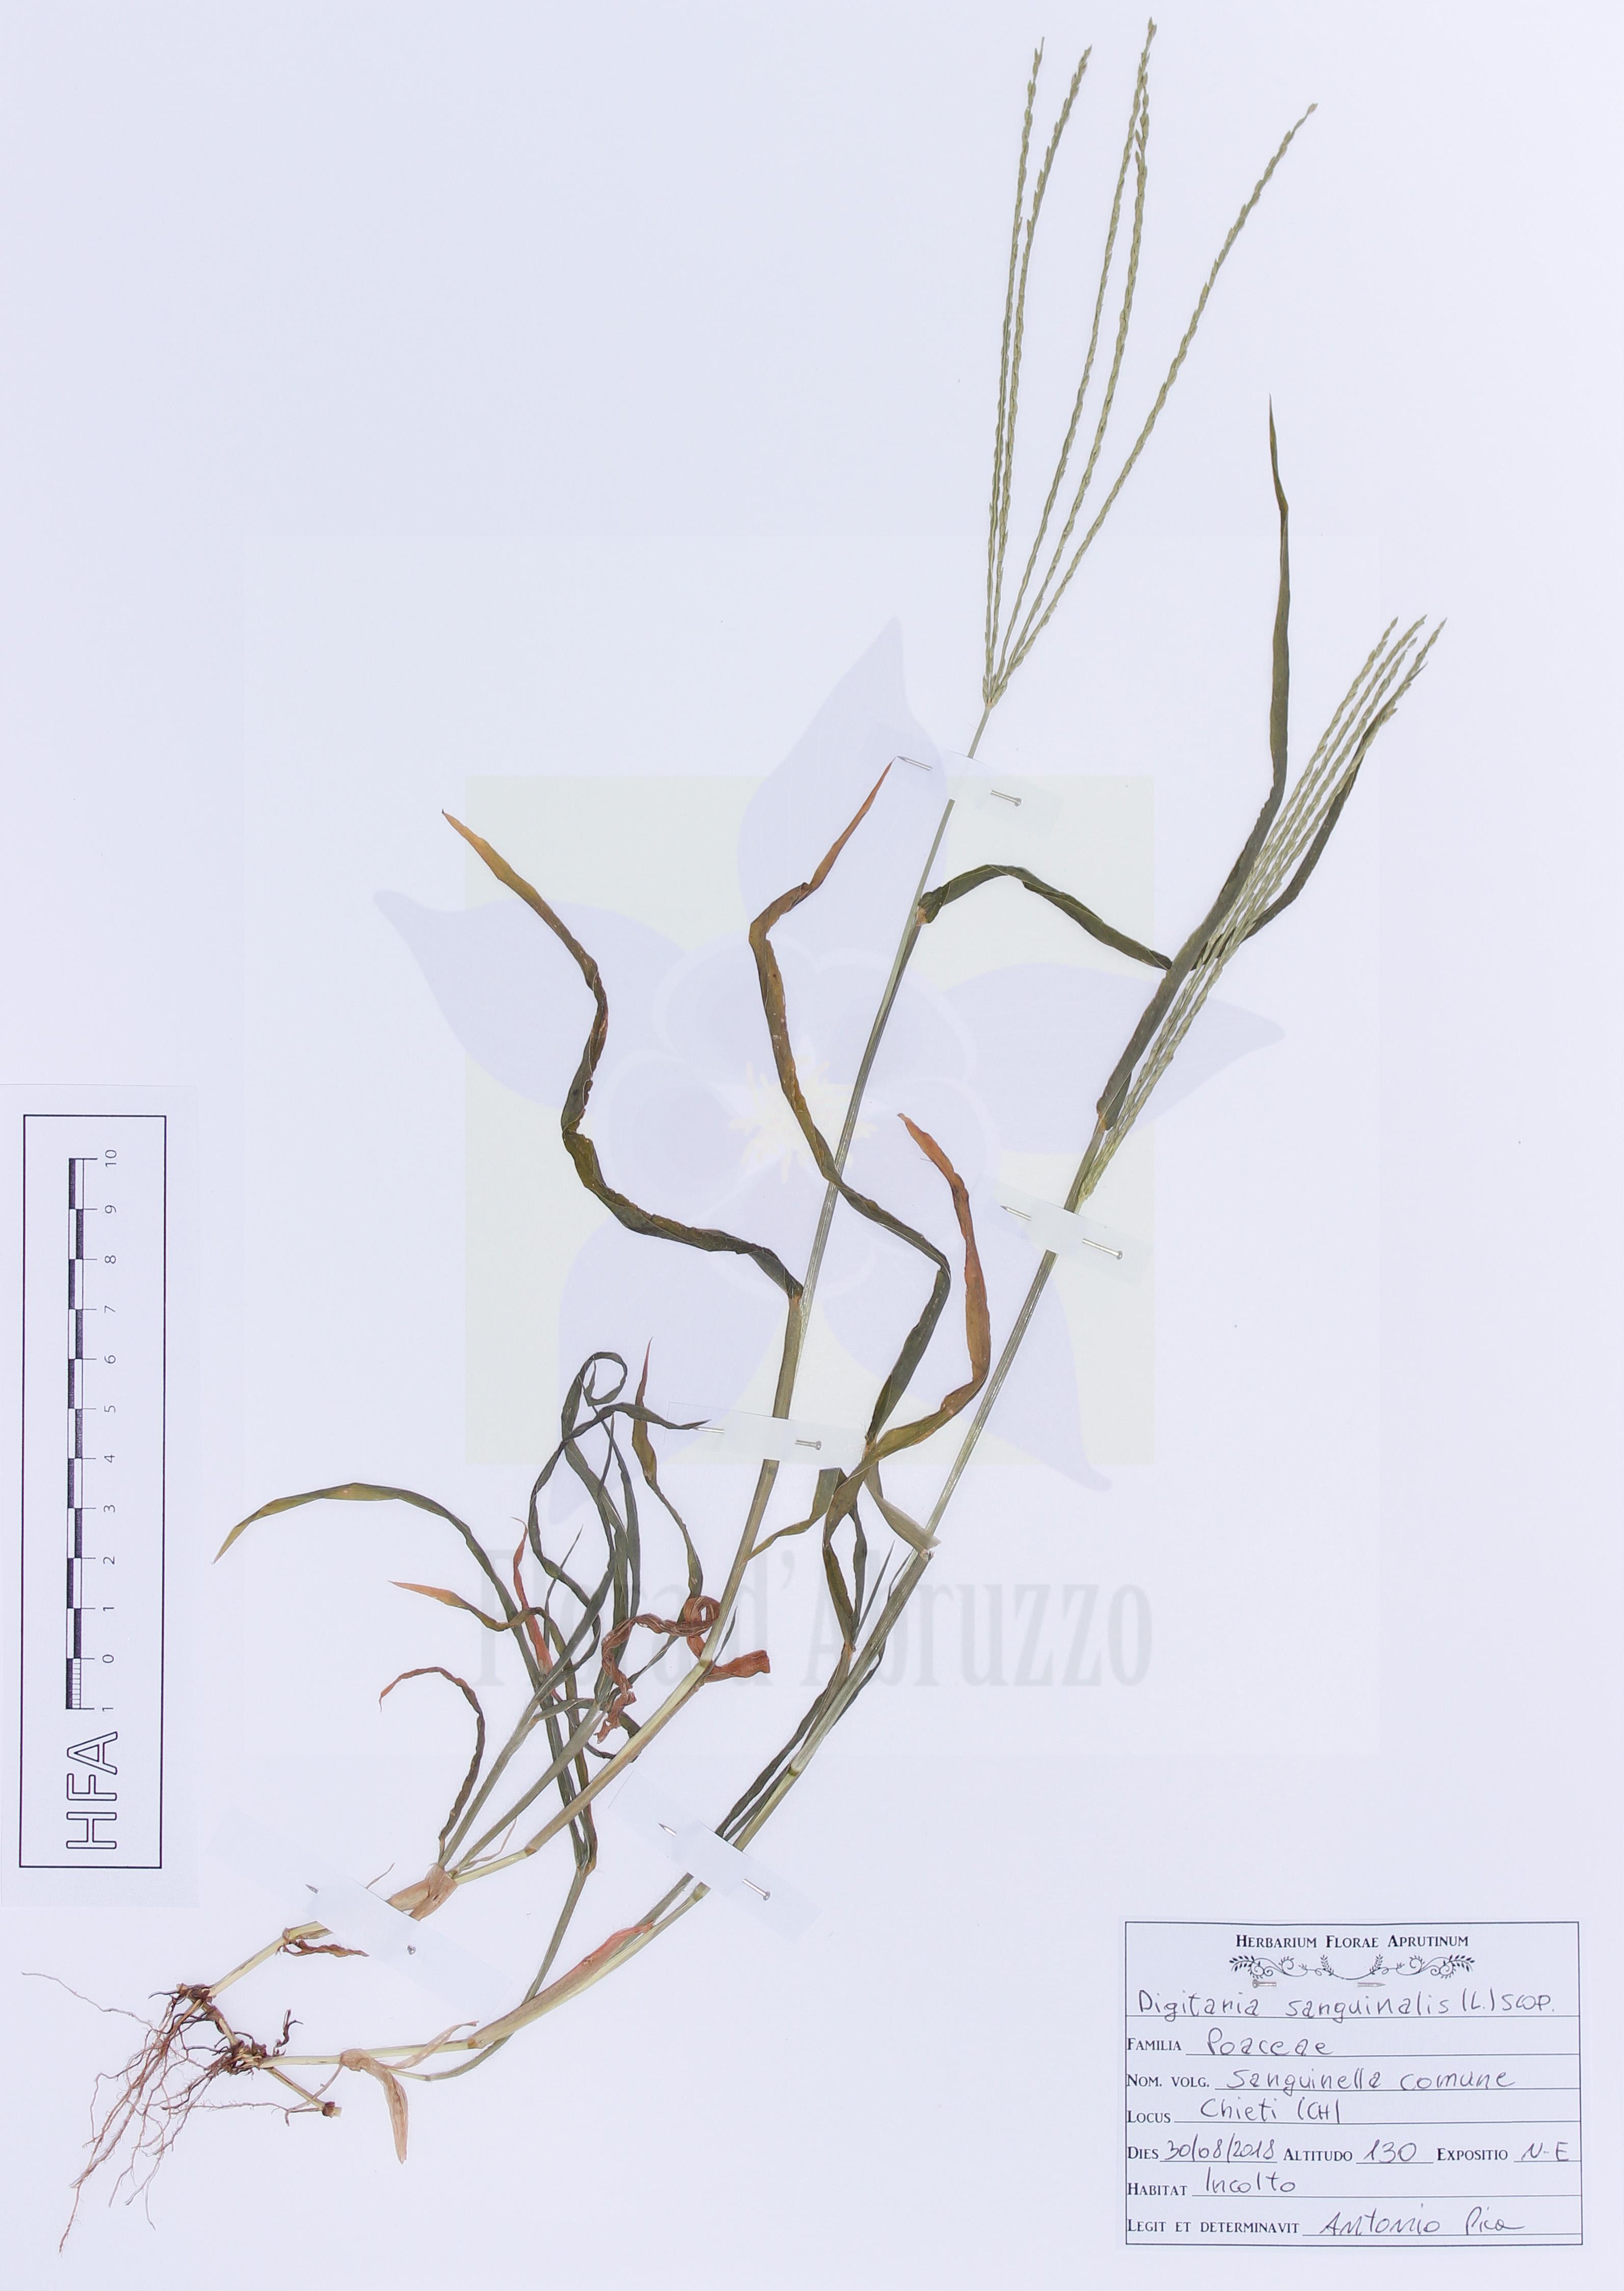 Digitaria sanguinalis(L.) Scop.